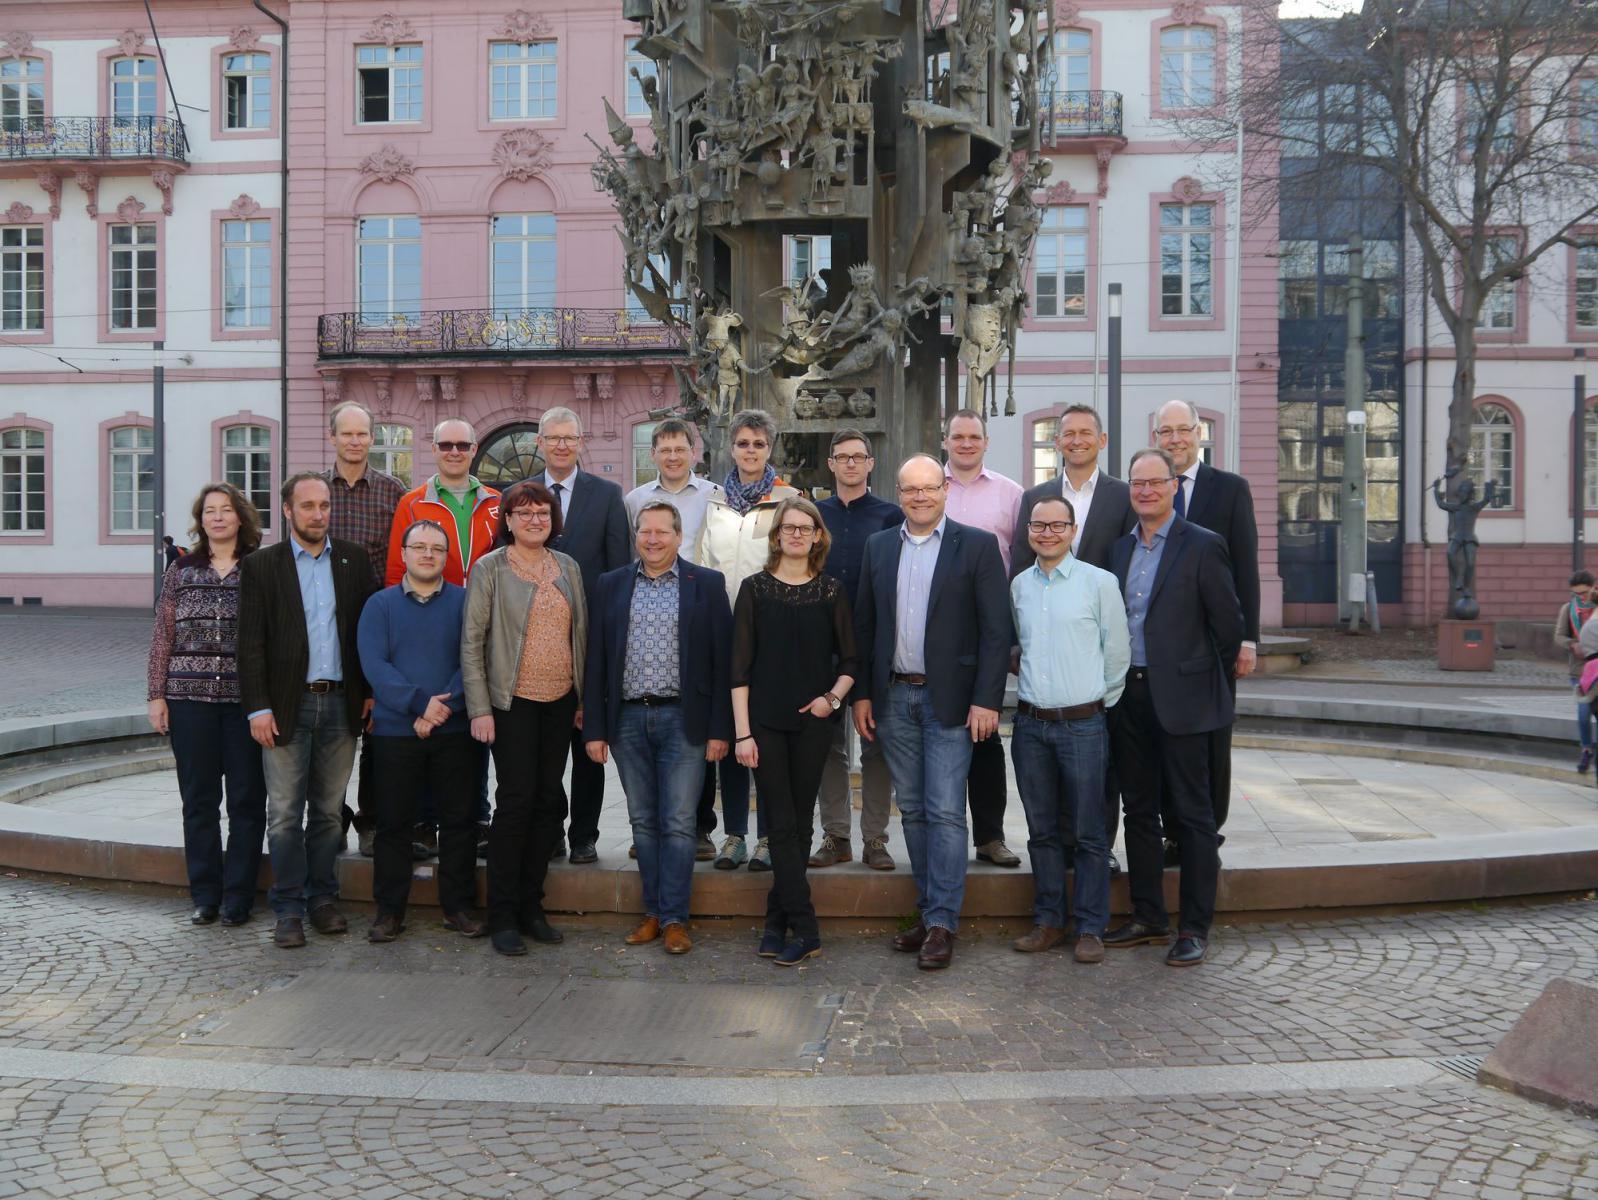 Gruppenbild AK 1 in Mainz